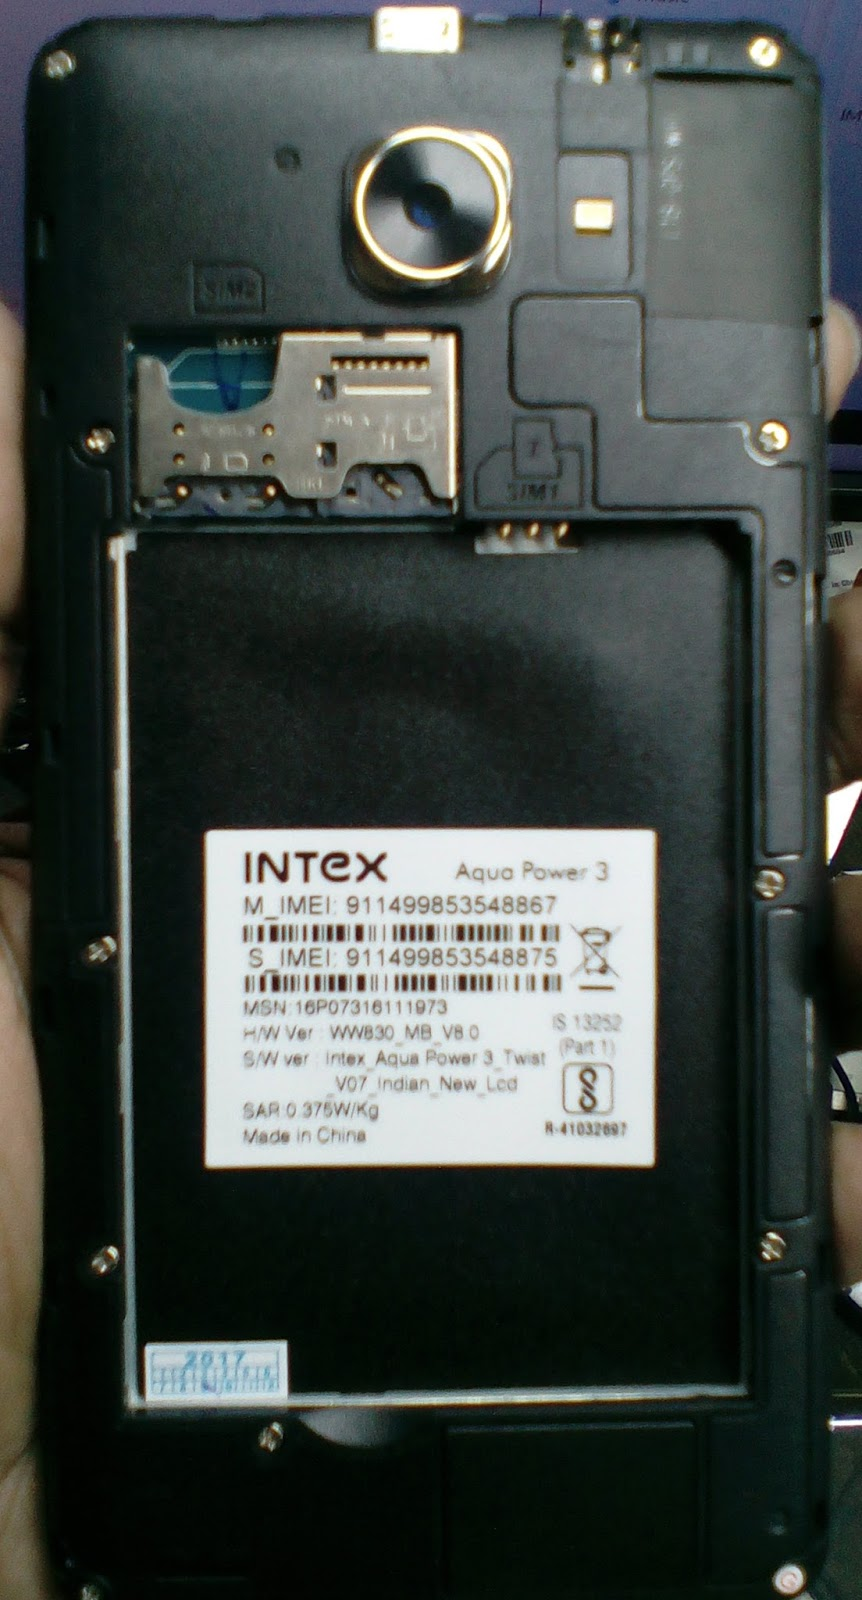 Intex Aqua Power 3 Flash File